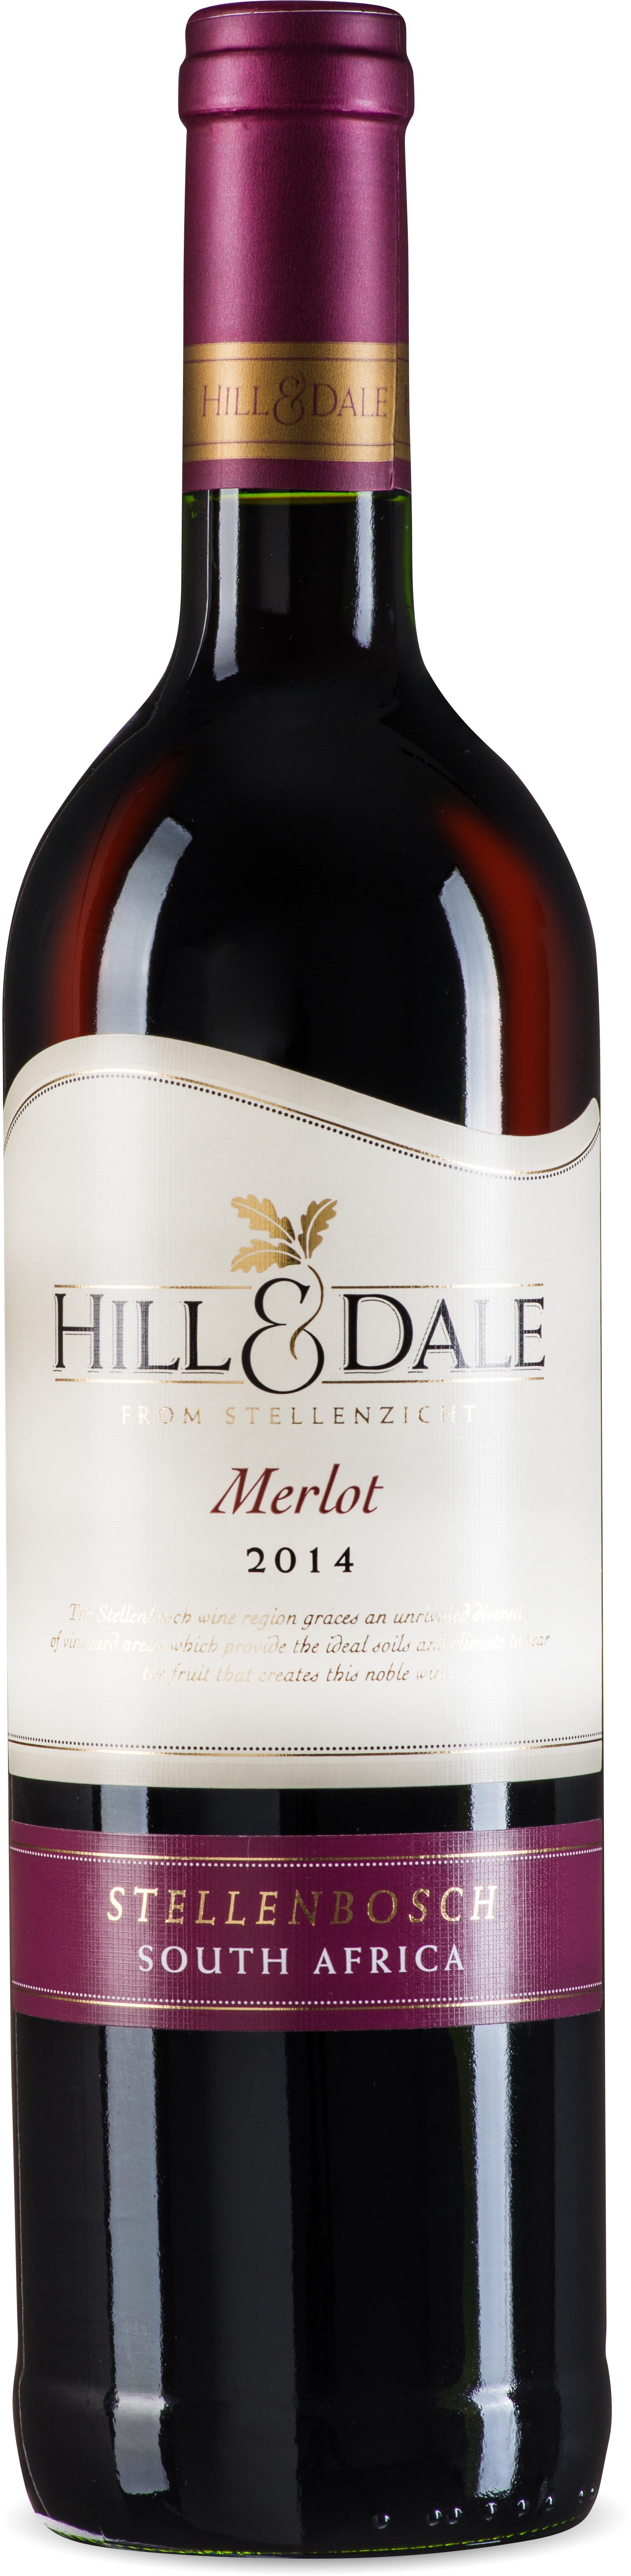 Hill & Dale Merlot